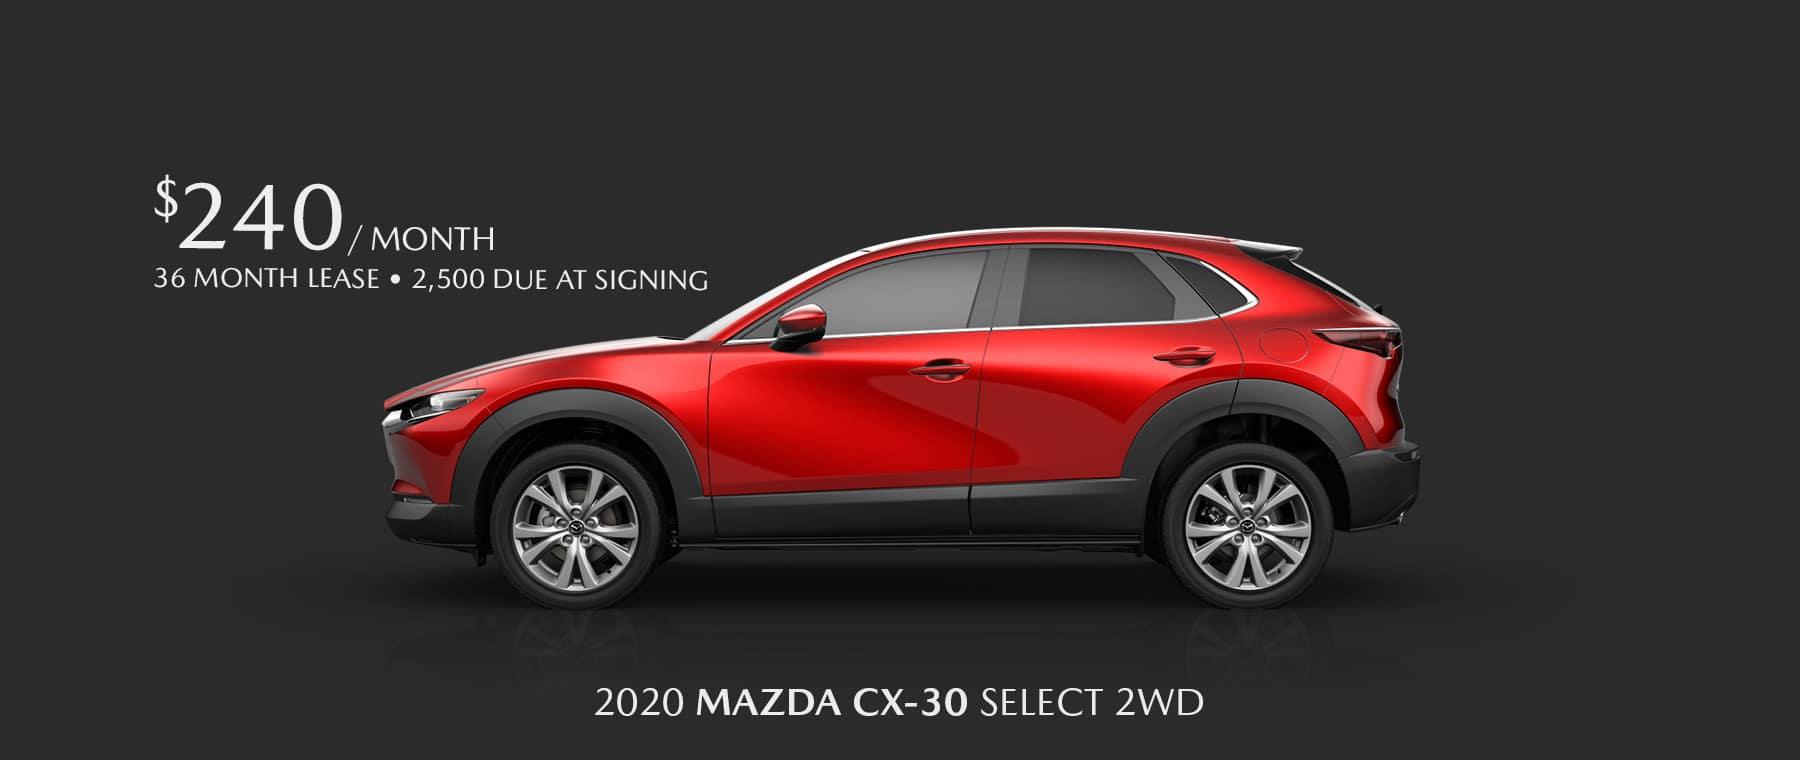 Mazda_CX30_240MO_1800x760